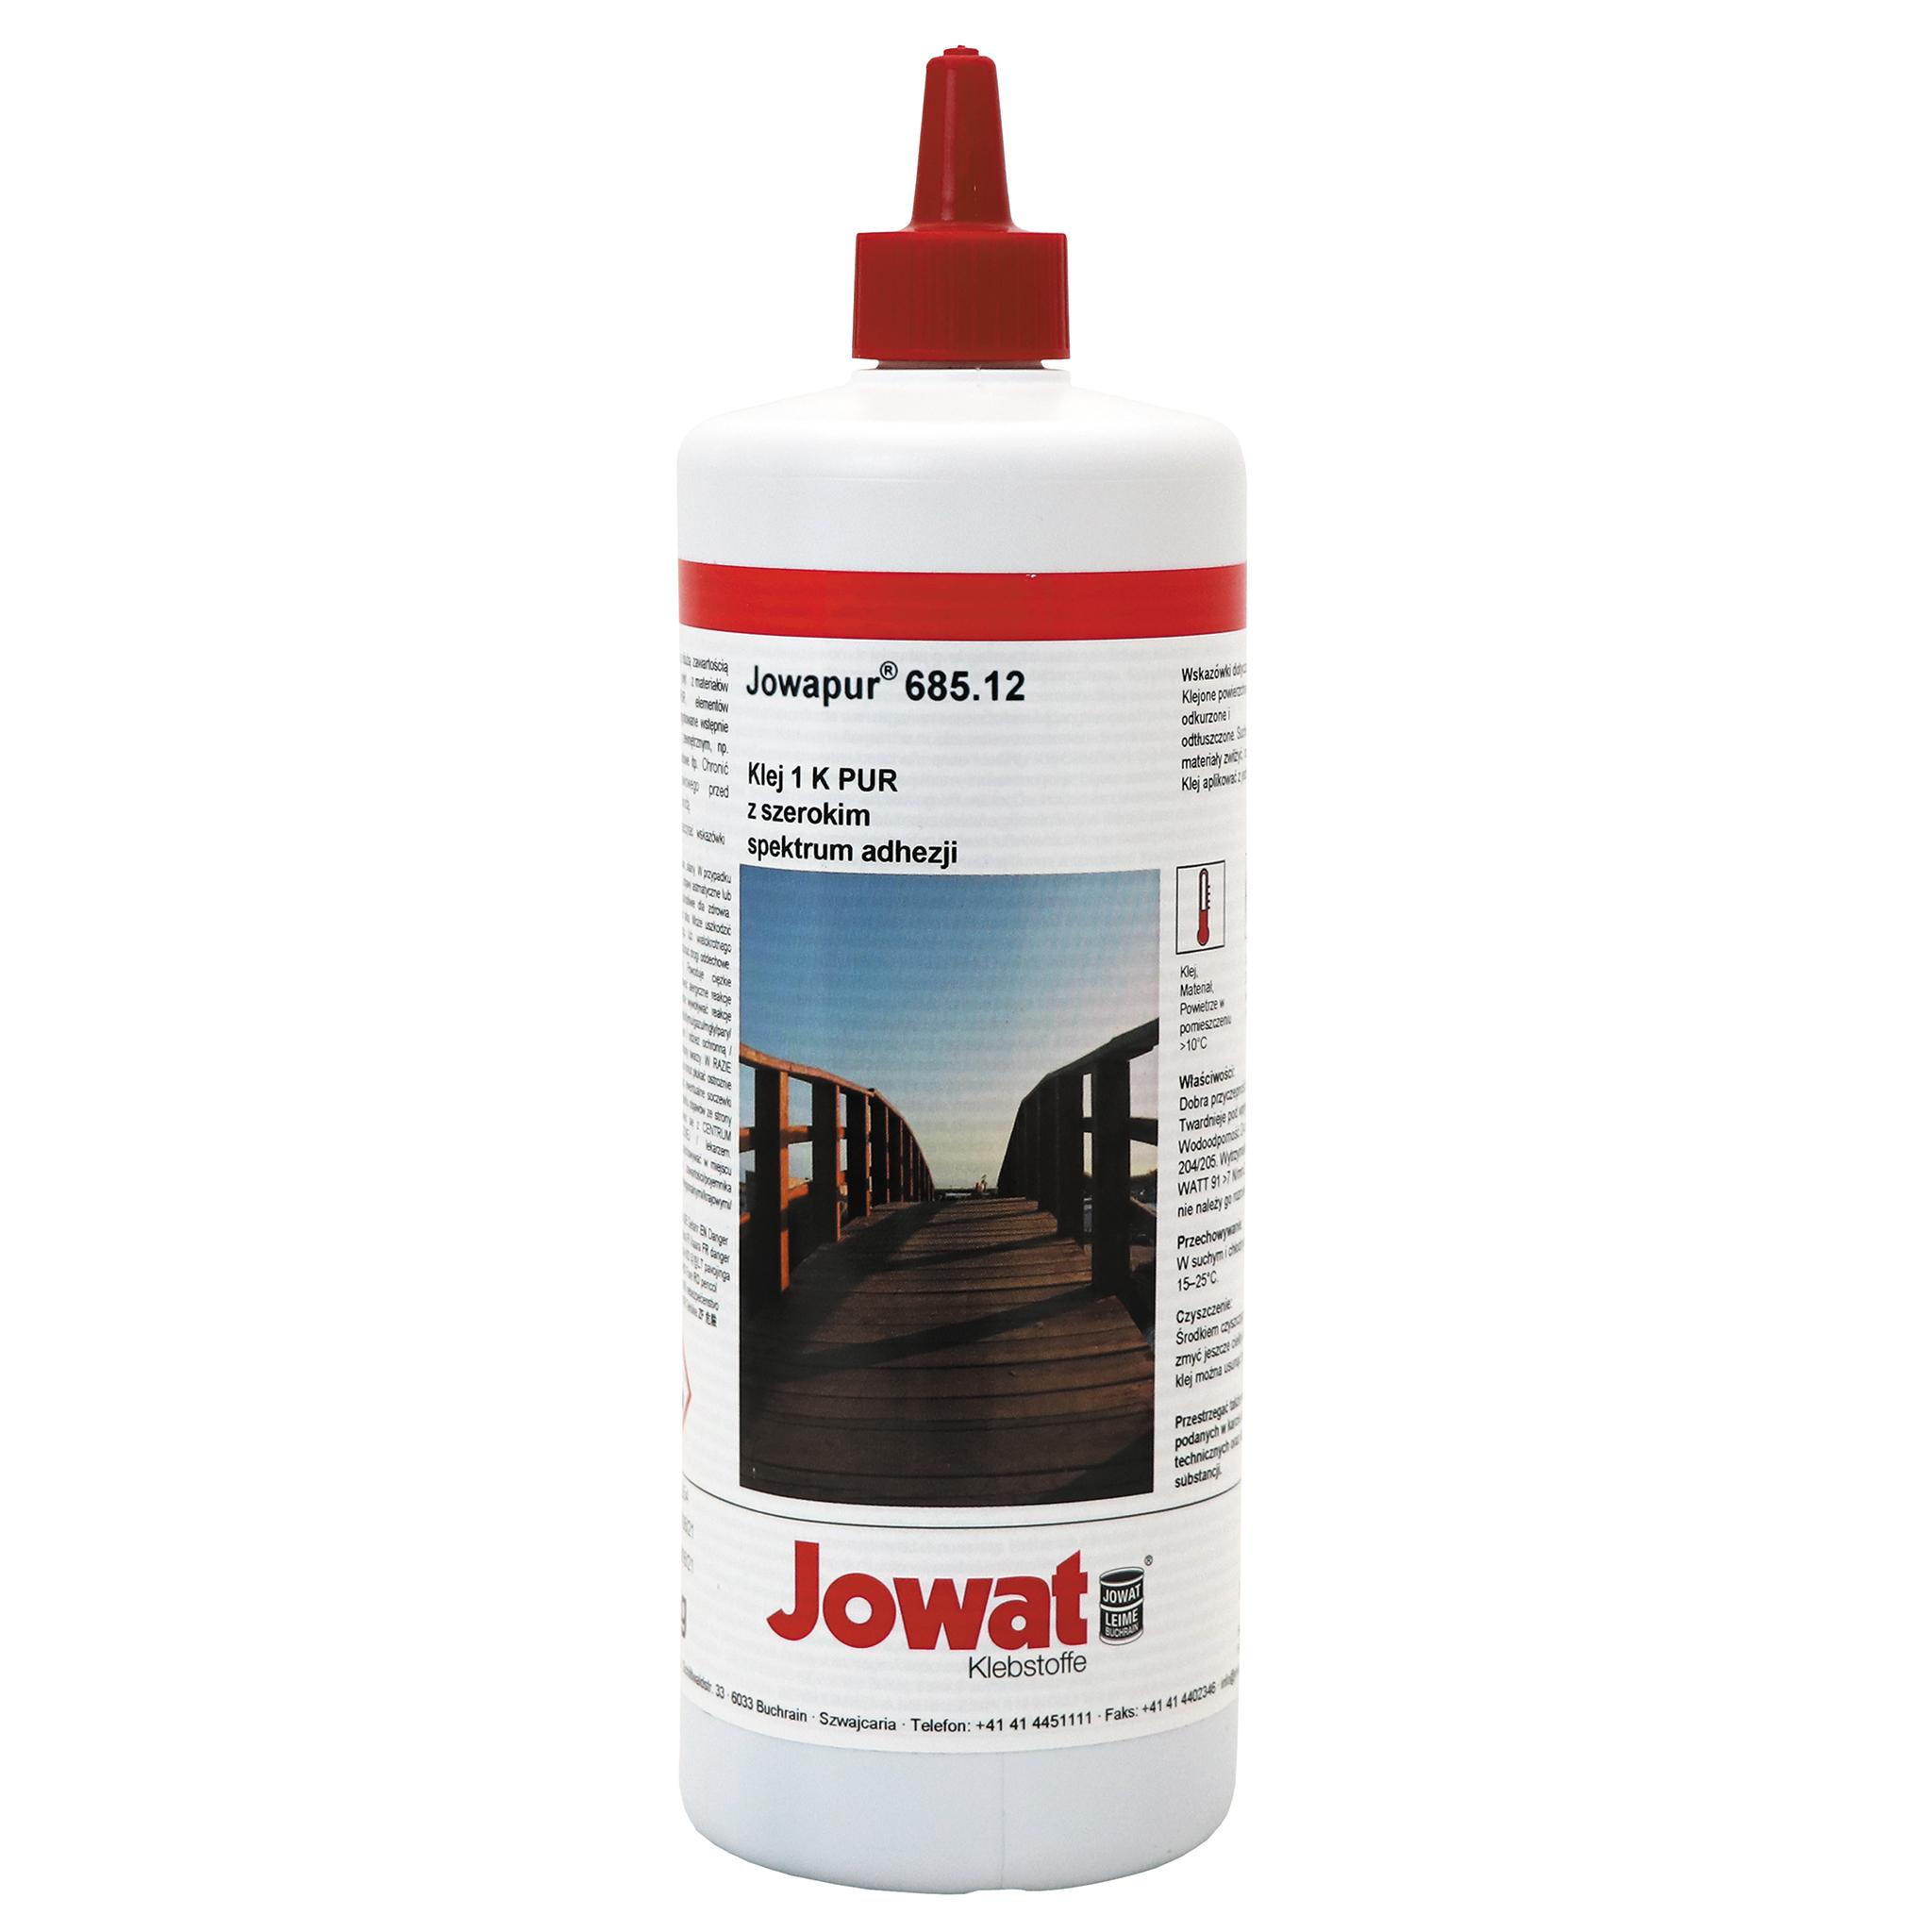 JOWAPUR 685.12 - PUR Prepolymer